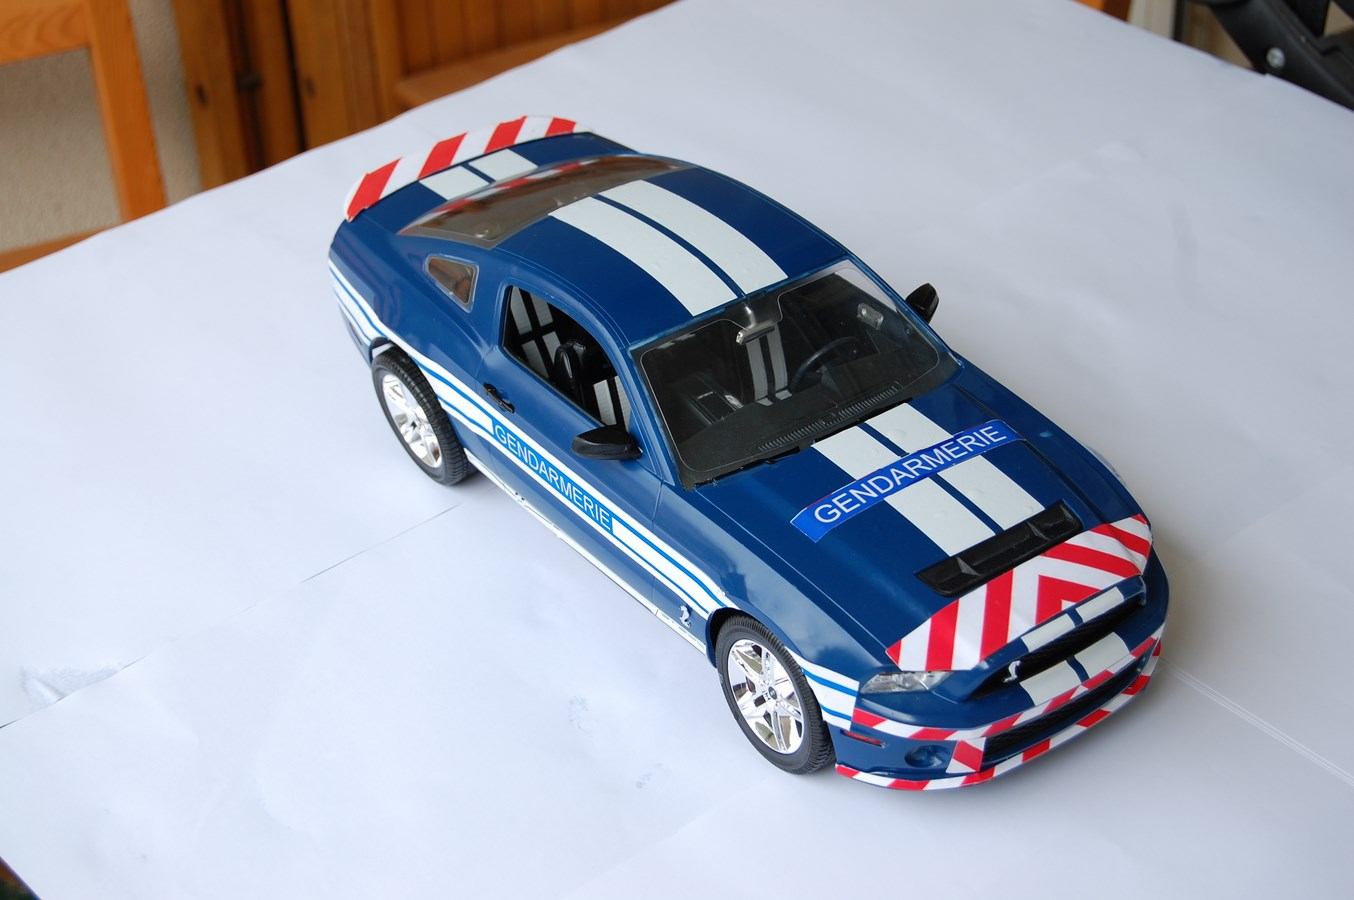 Shelby GT 500 version imaginaire Gendarmerie - Page 2 621836Mustang39Copier